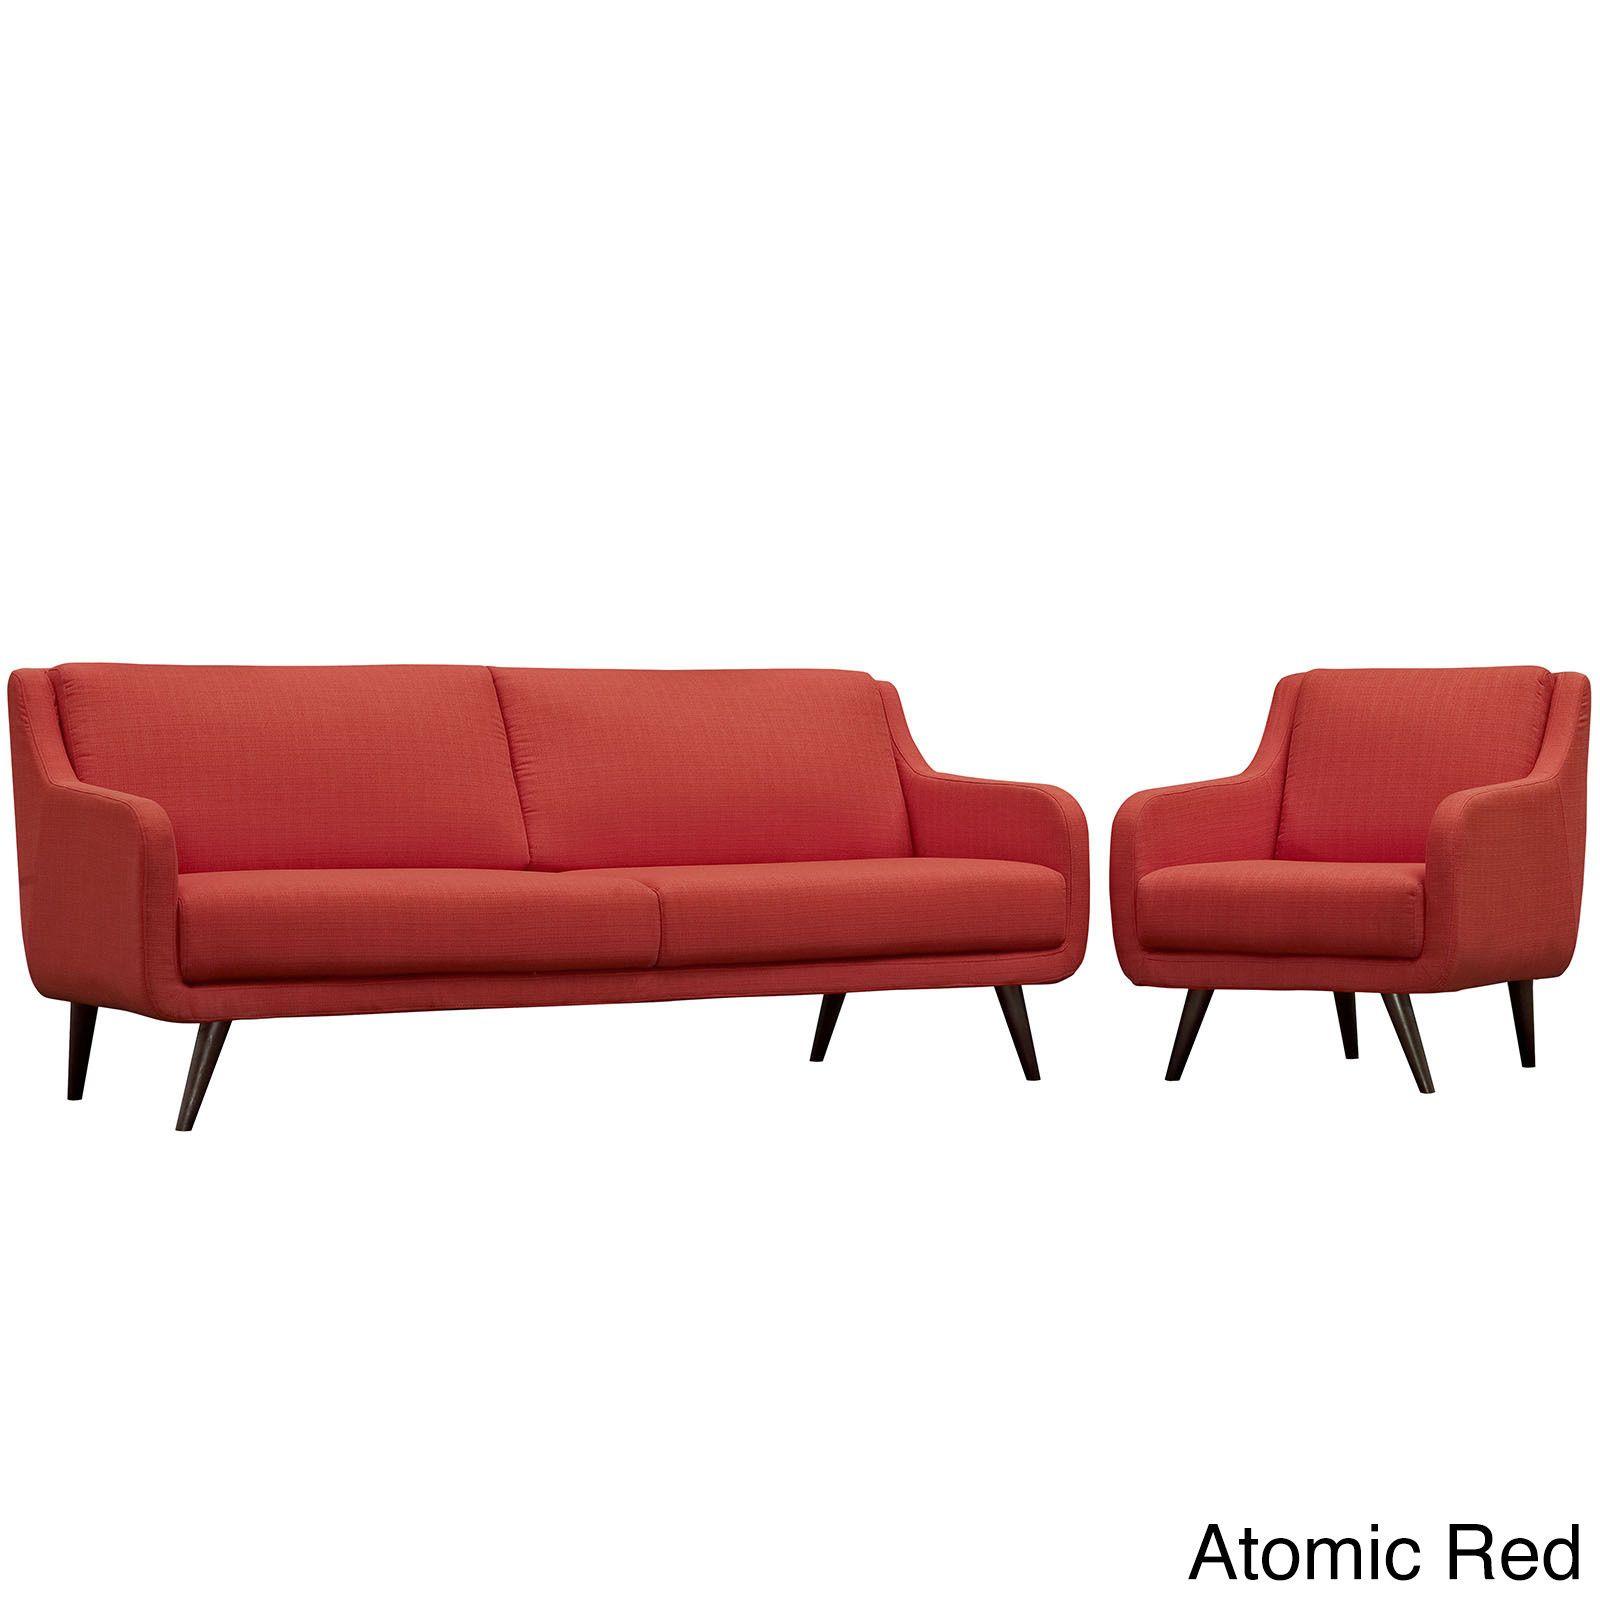 Modway Verve Grey/Espresso Polyester/Rubberwood Living Room Set (Set of 2) (Atomic Red), Beige Off-White